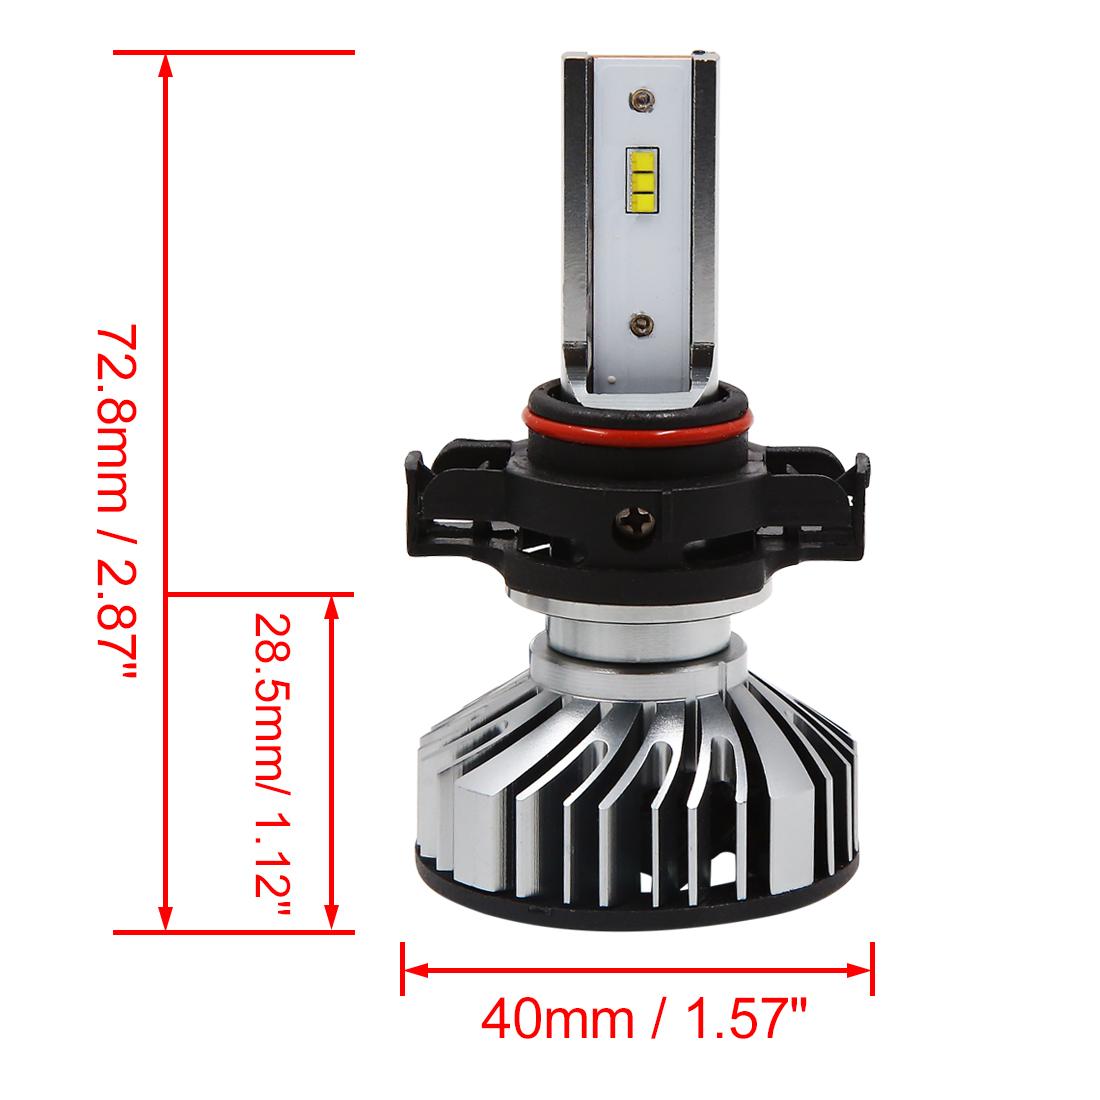 2pcs 1.4A 30W 5202  Headlight White 6000K Bright Greater Visibility Bulb - image 5 de 8